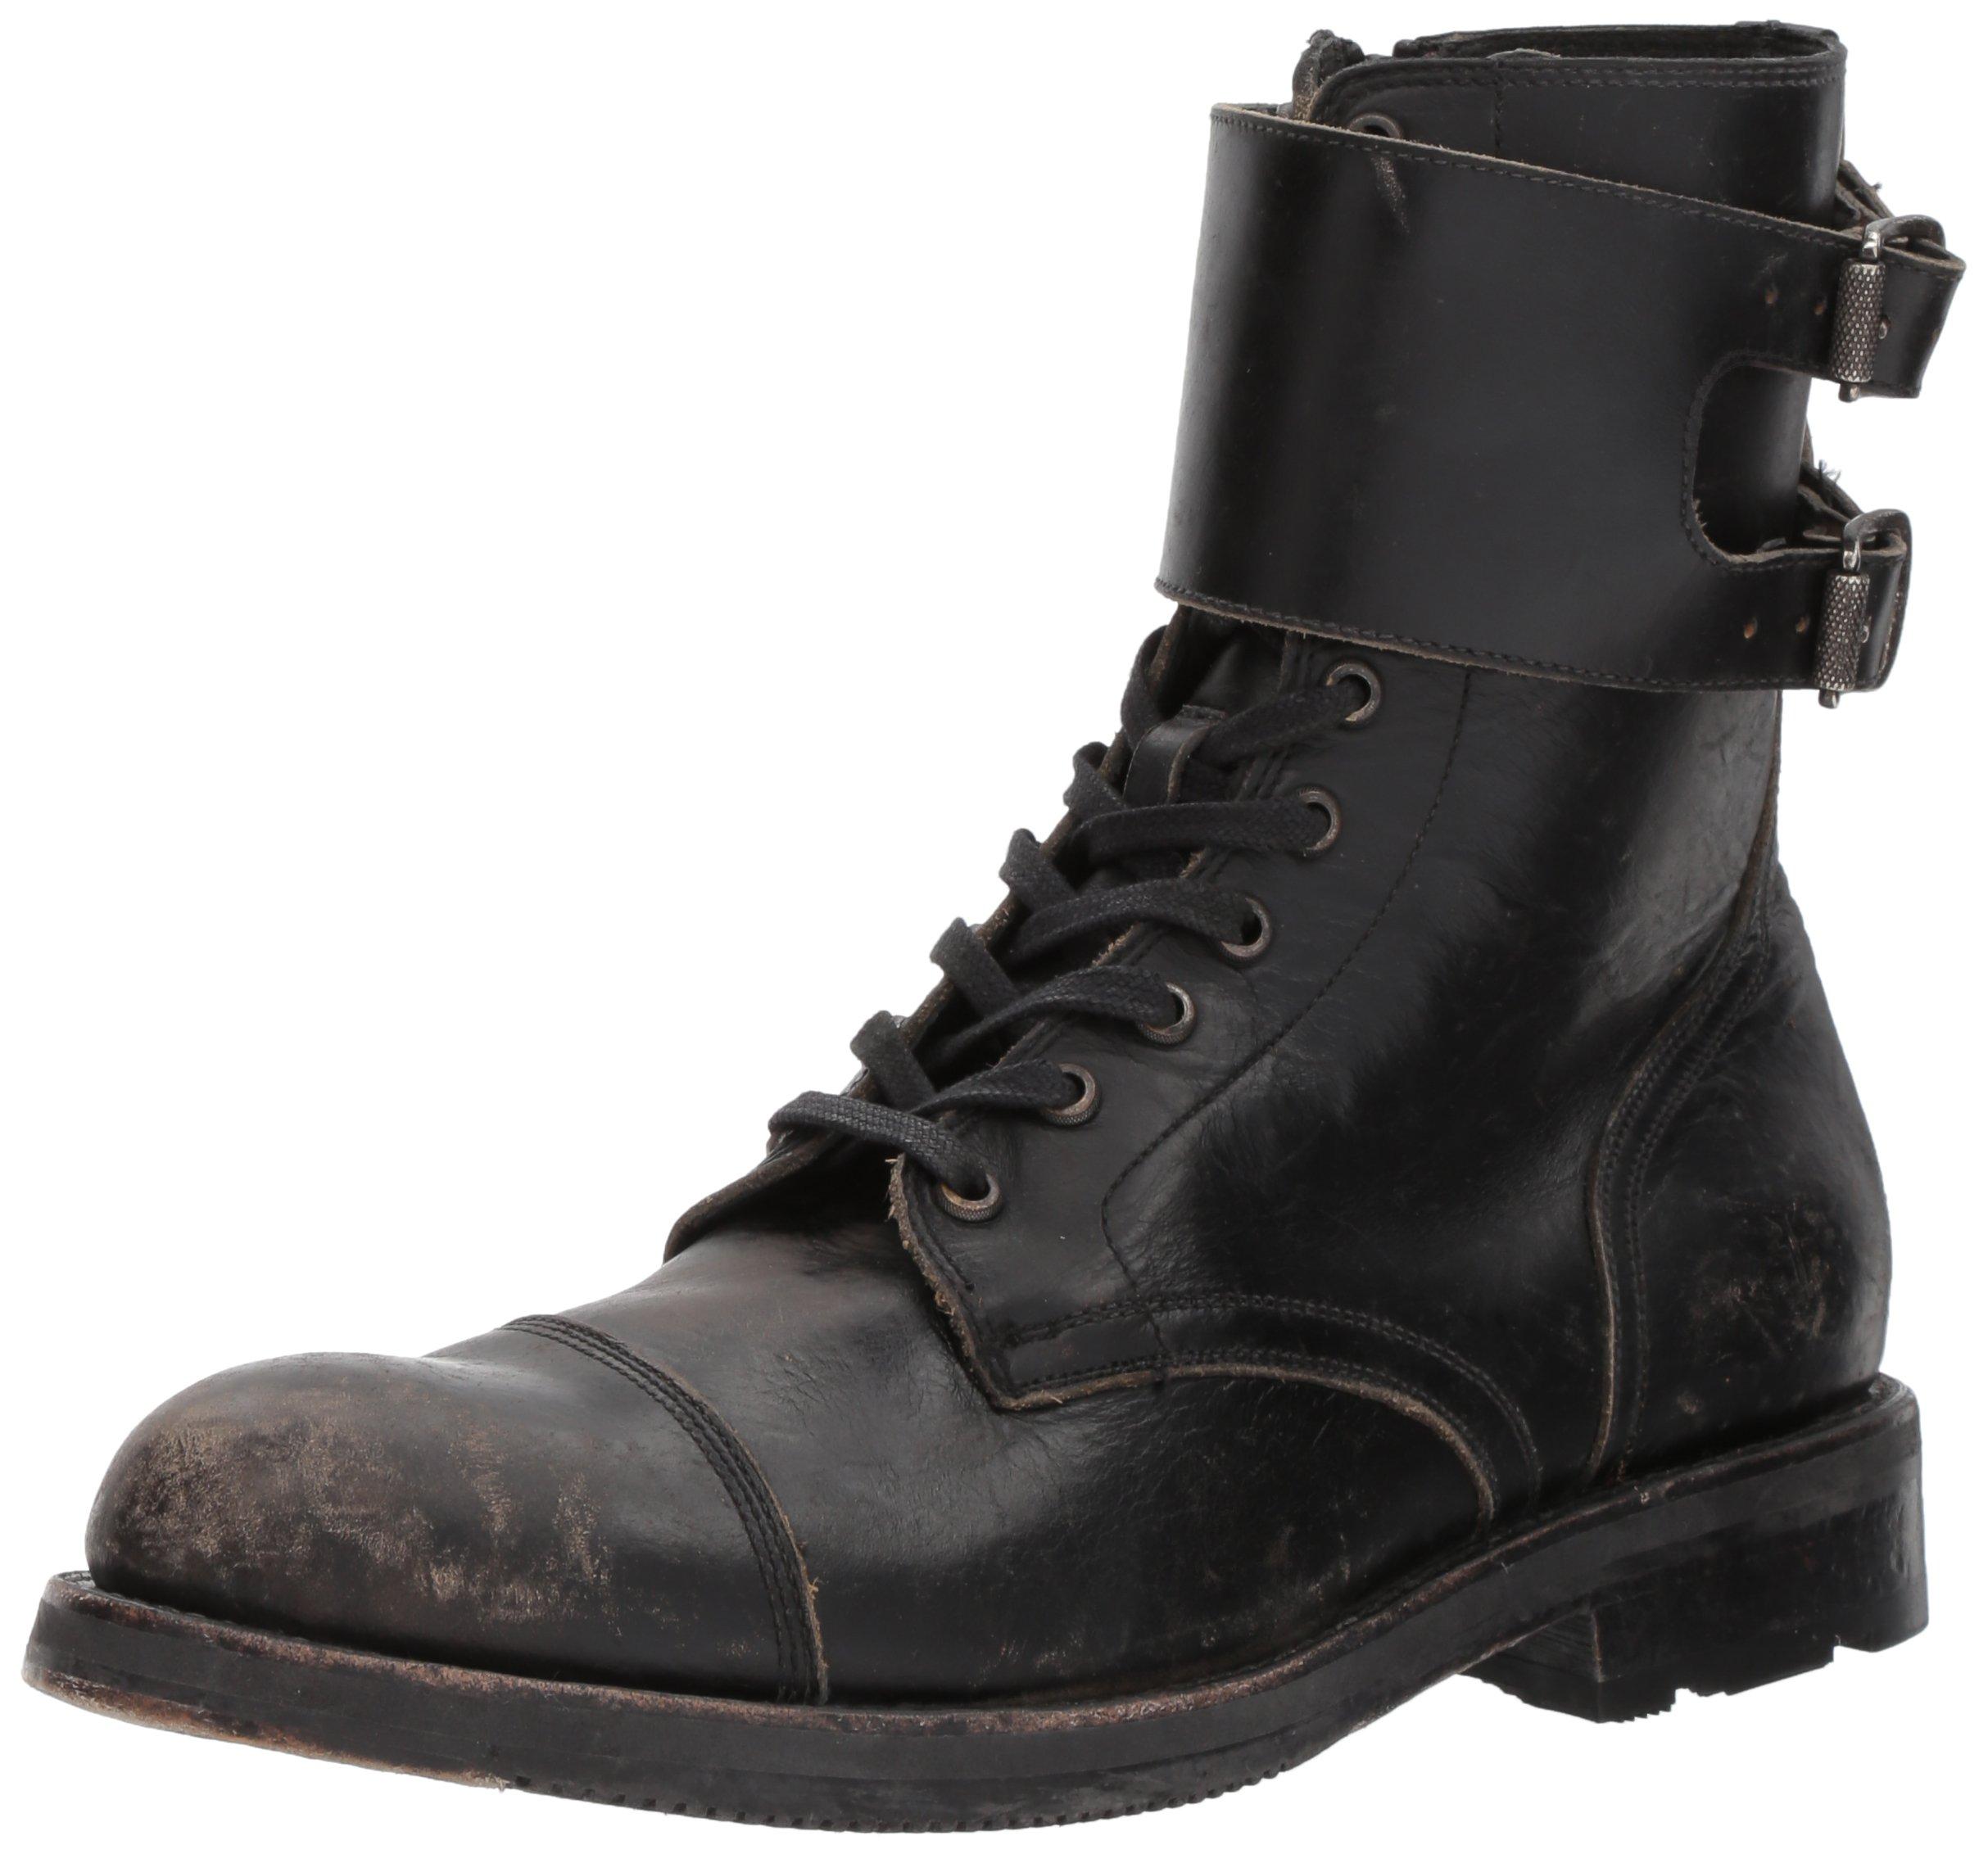 FRYE Men's Officer Cuff Combat Boot, Black, 9 D US